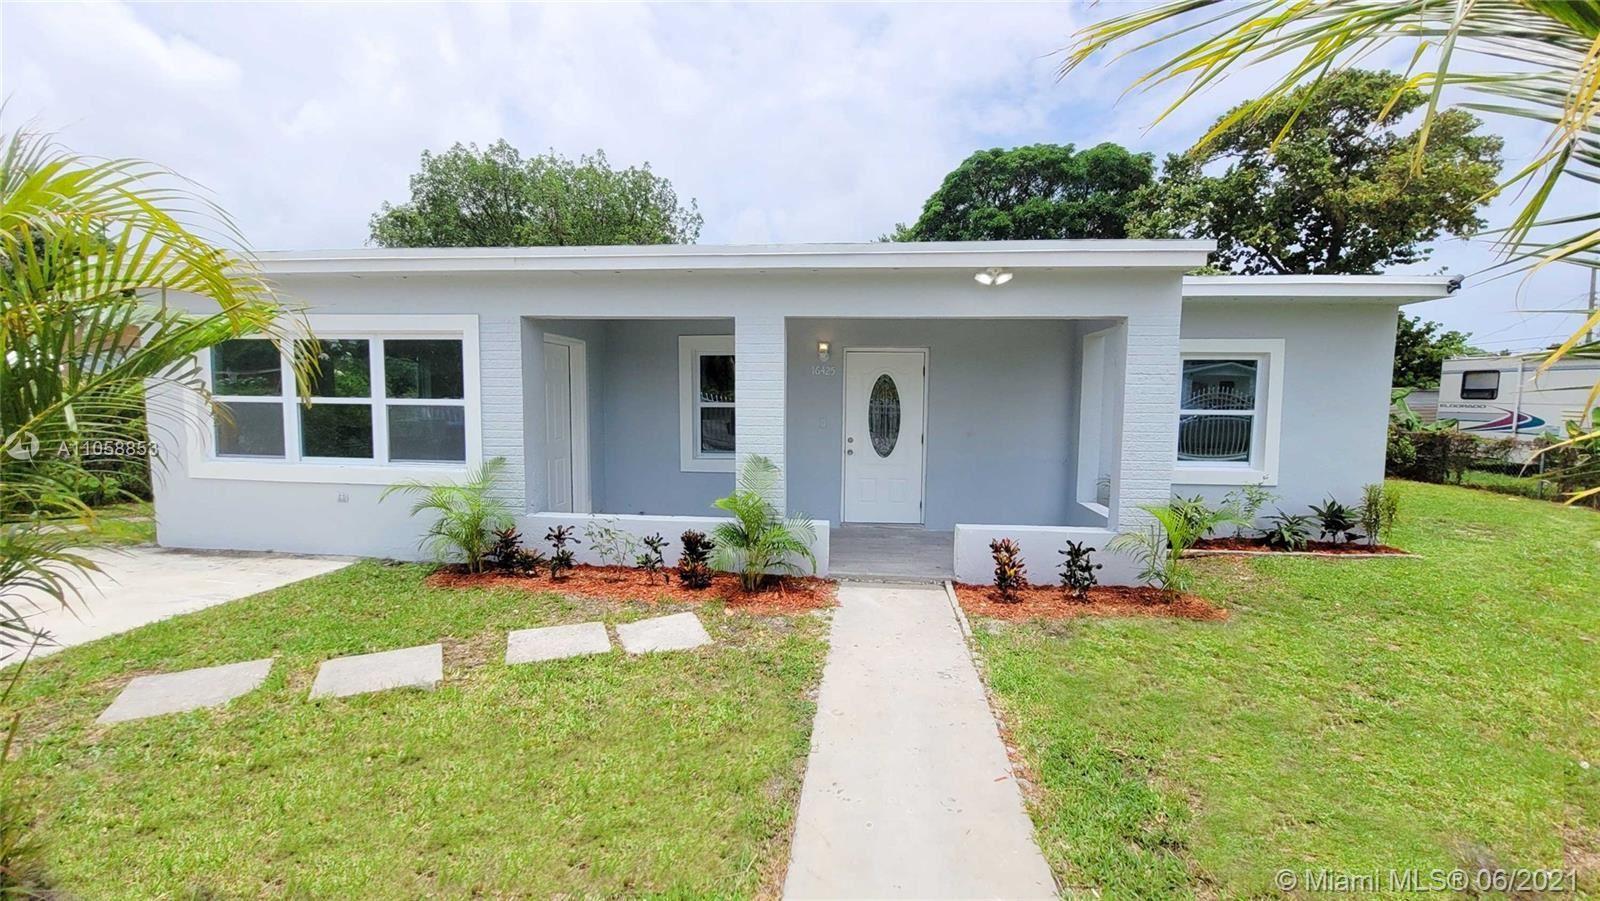 16425 NW 162nd Street Rd, Miami Gardens, FL 33054 - #: A11058853